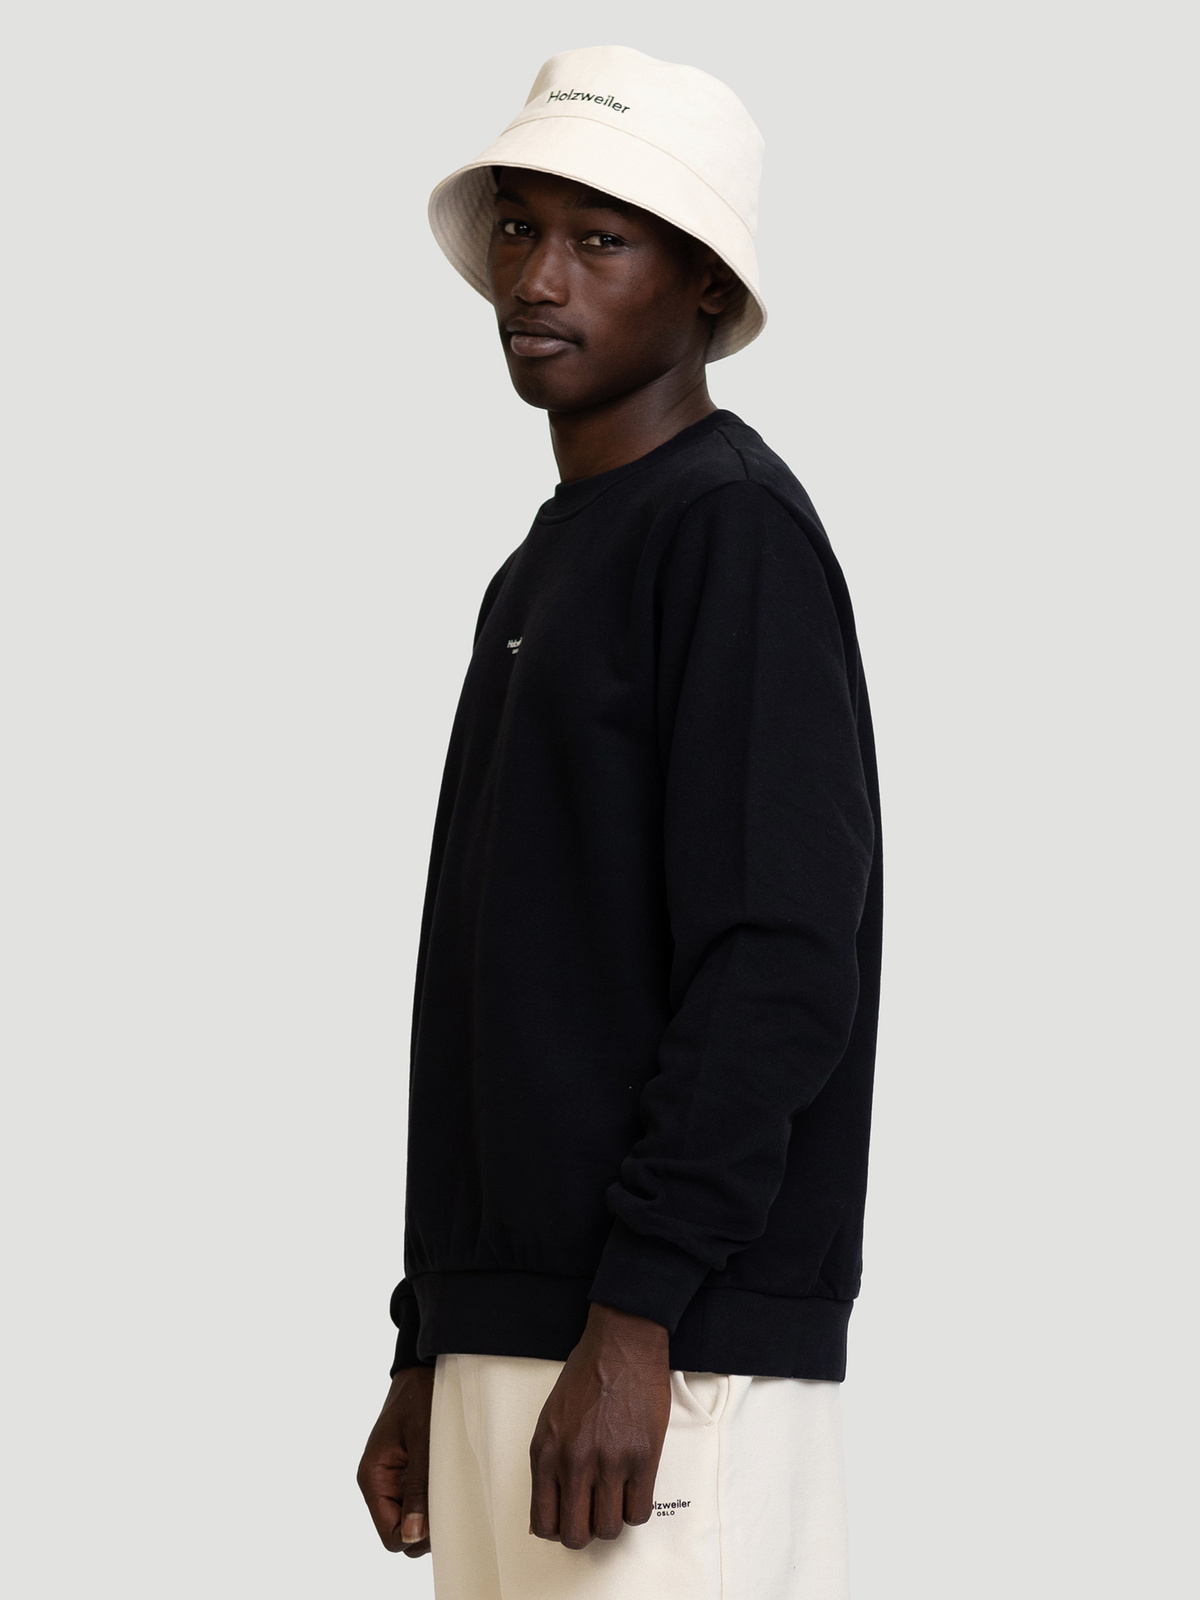 M. Oslo Crew Black 3